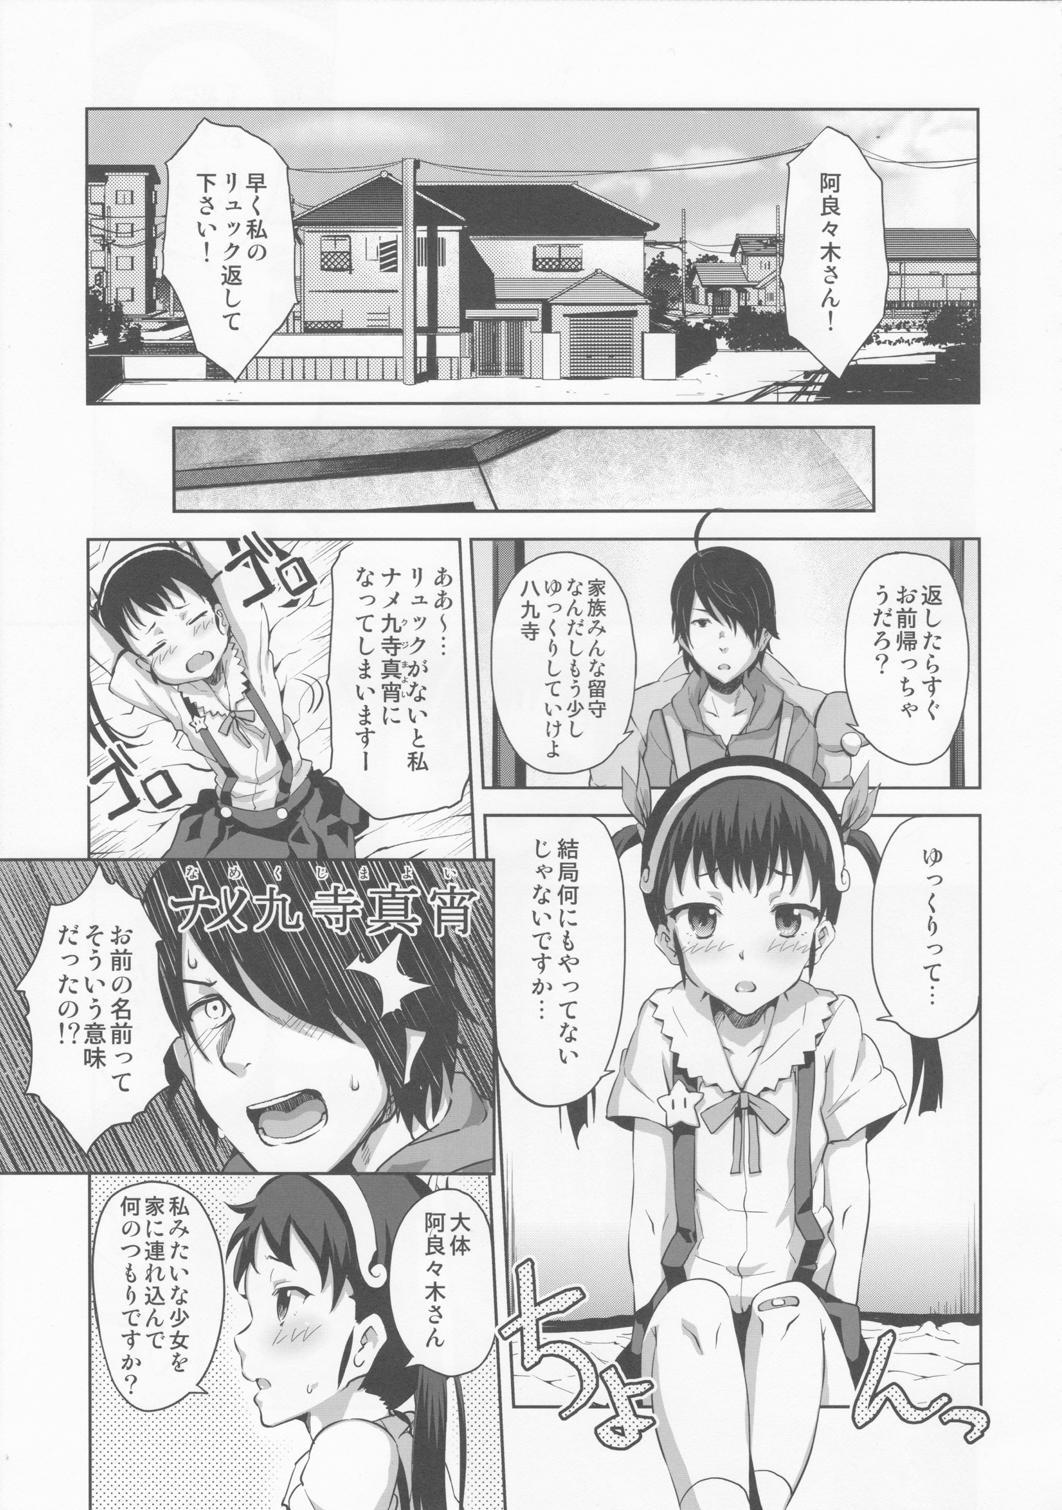 Namekuji Mayoigatari 3